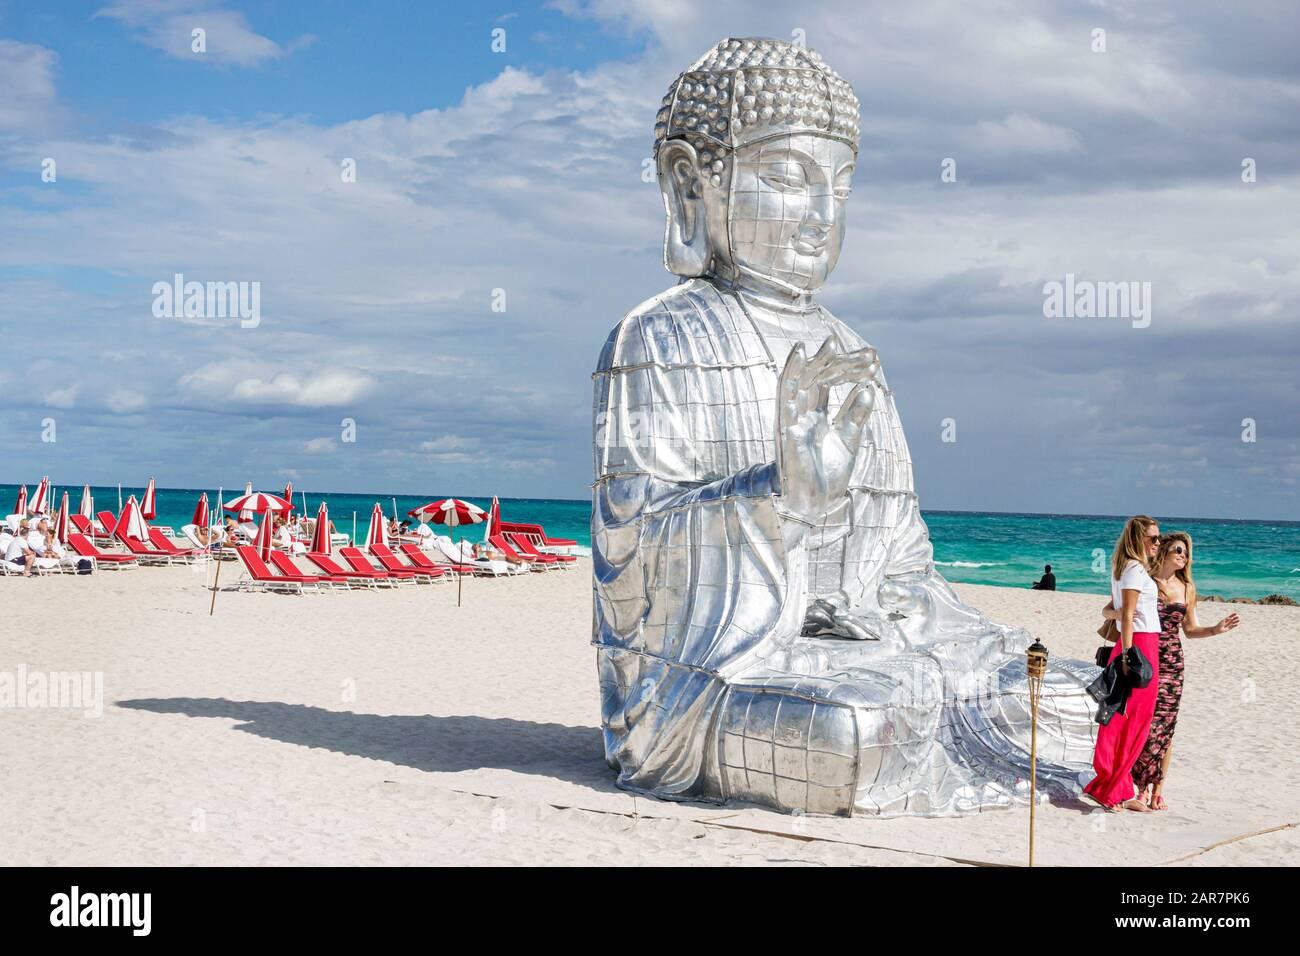 Miami Beach Florida,Atlantic Ocean,Art Basel Week,Faena District,cultural neighborhood,Buddha,monumental sculpture,Chinese artist Zhang Huan,woman,pos Stock Photo